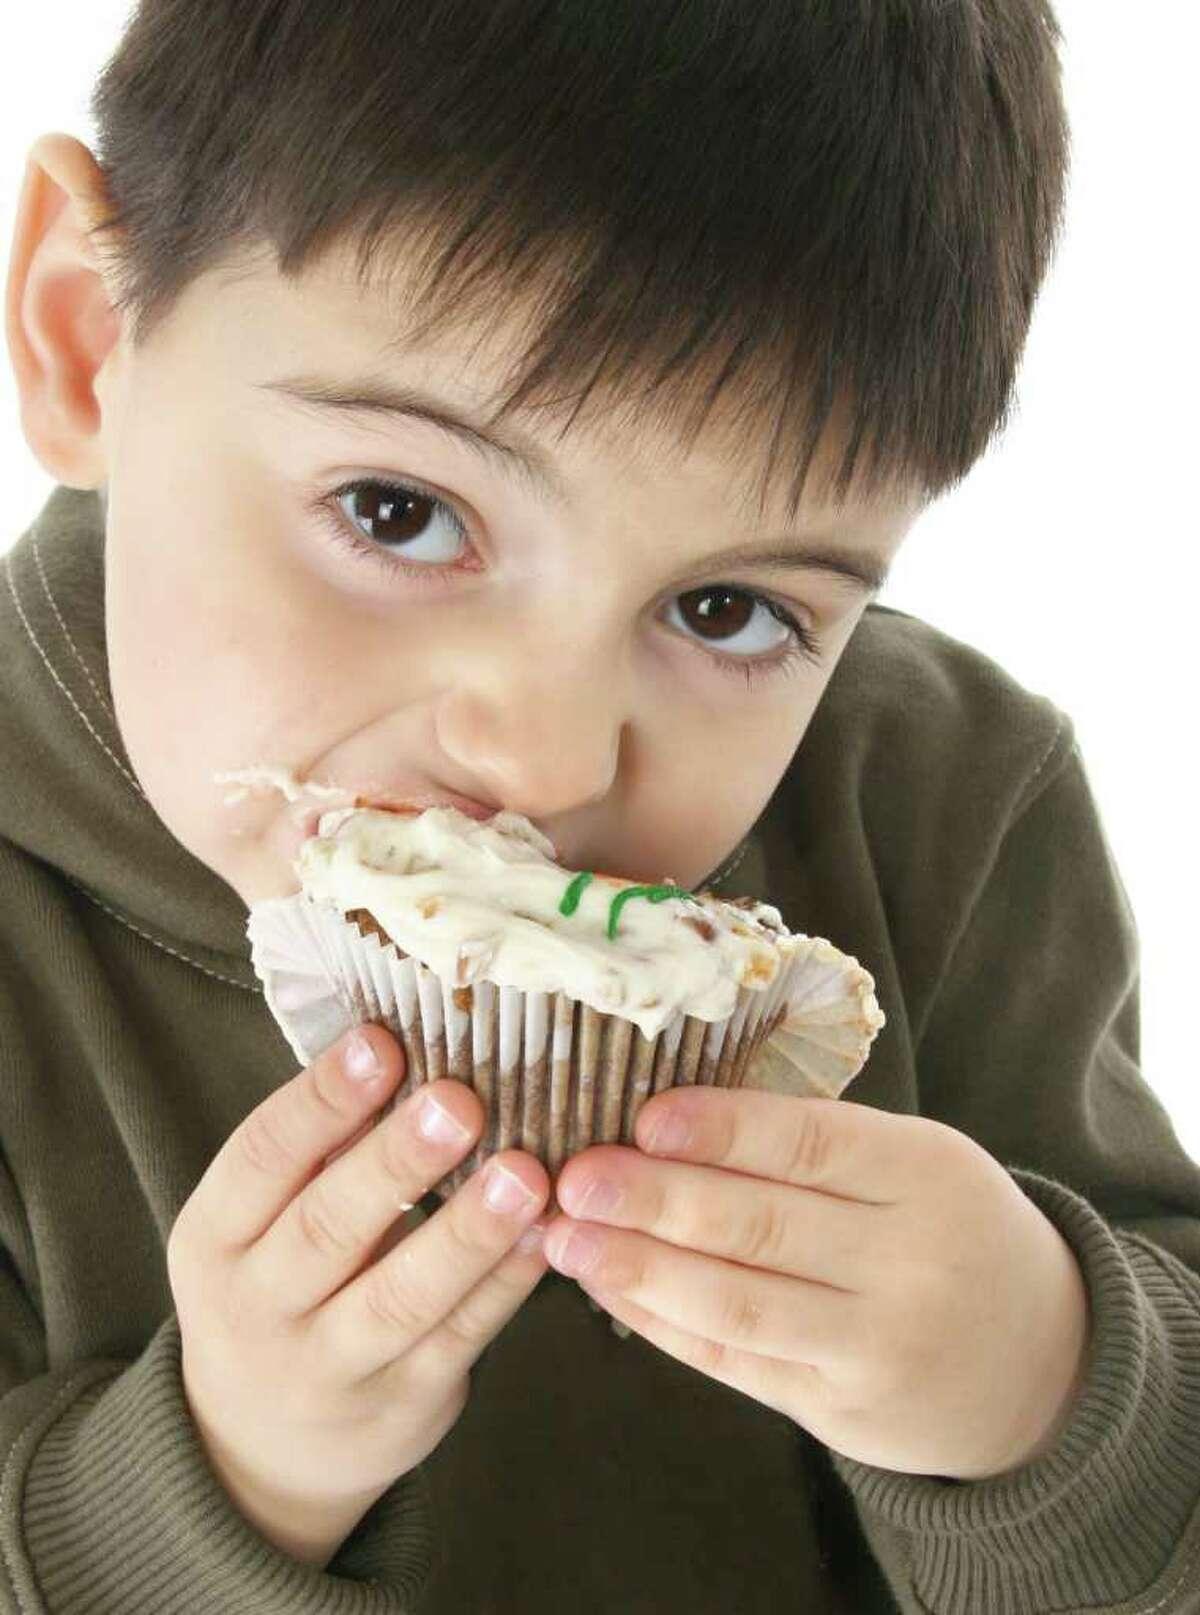 Three year old boy eathing iced carrot cake cupcake.